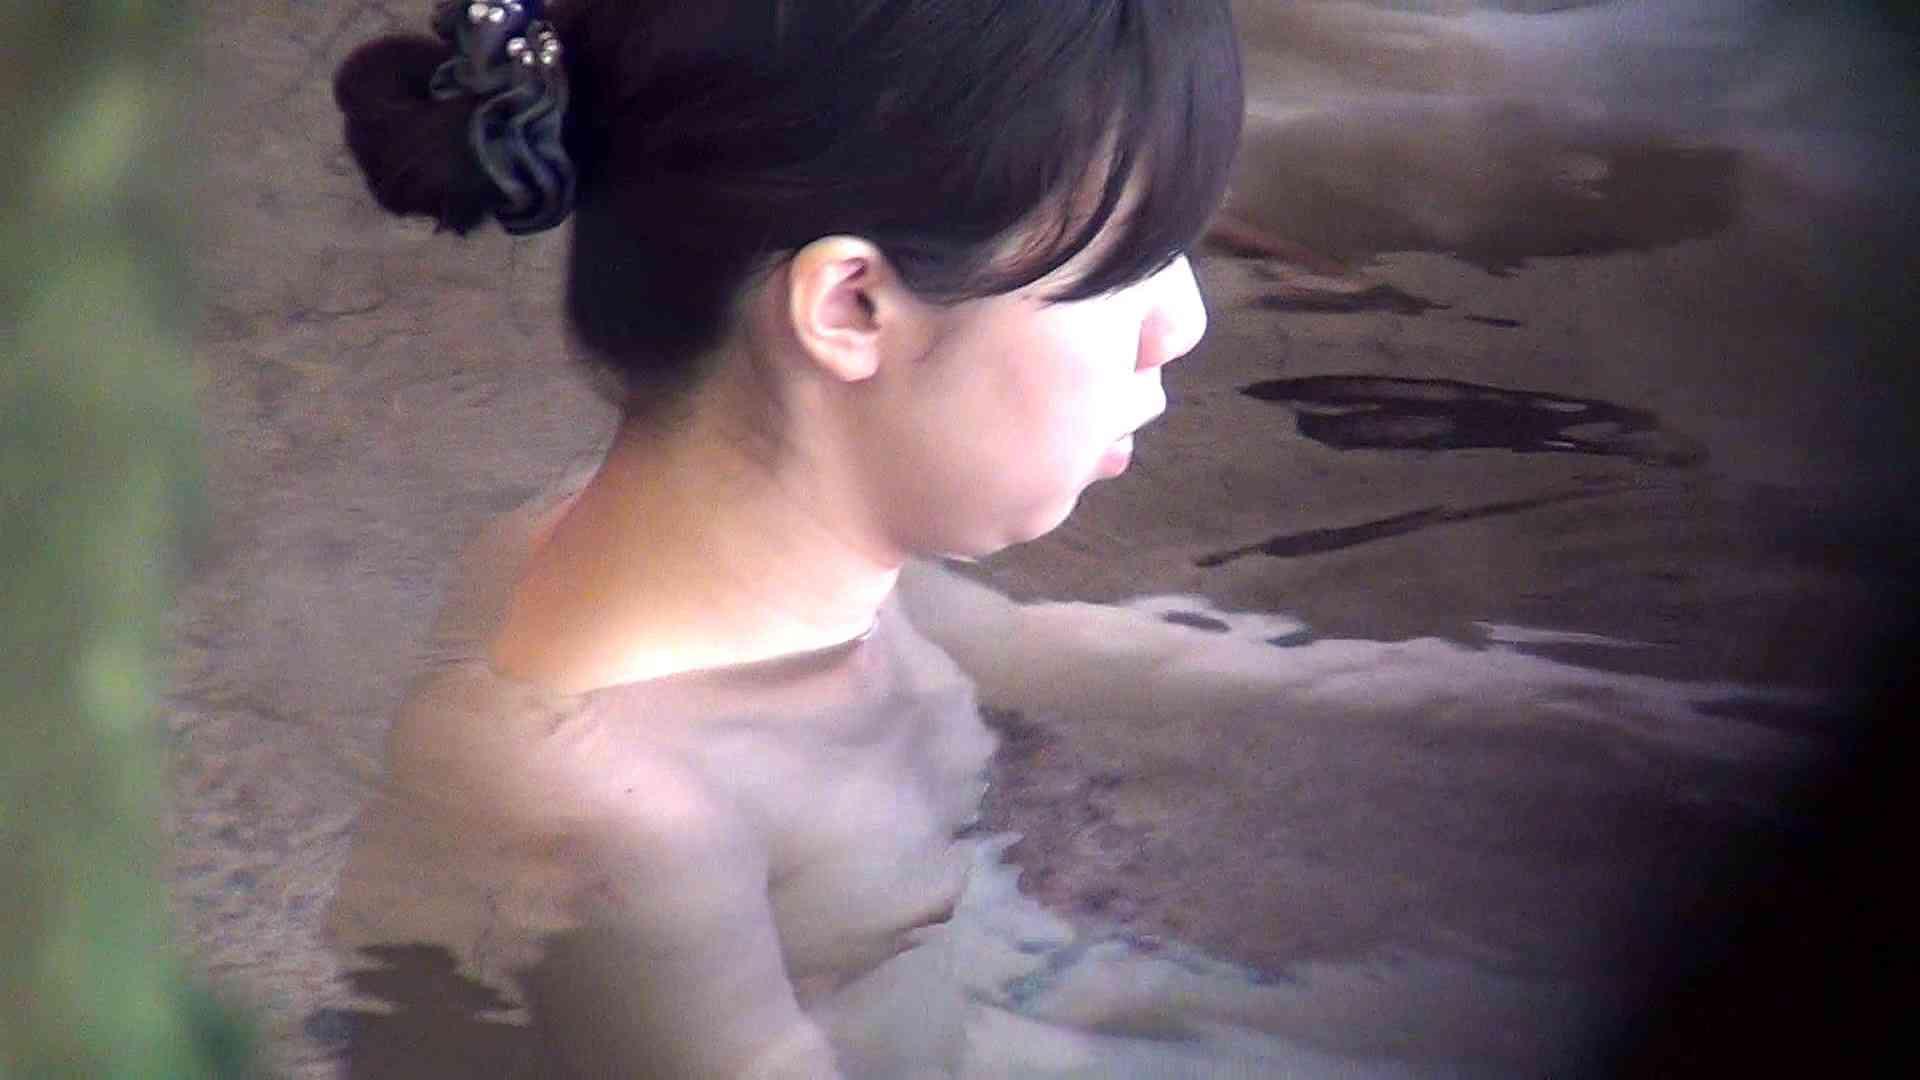 Aquaな露天風呂Vol.285 いやらしいOL AV無料動画キャプチャ 27連発 27